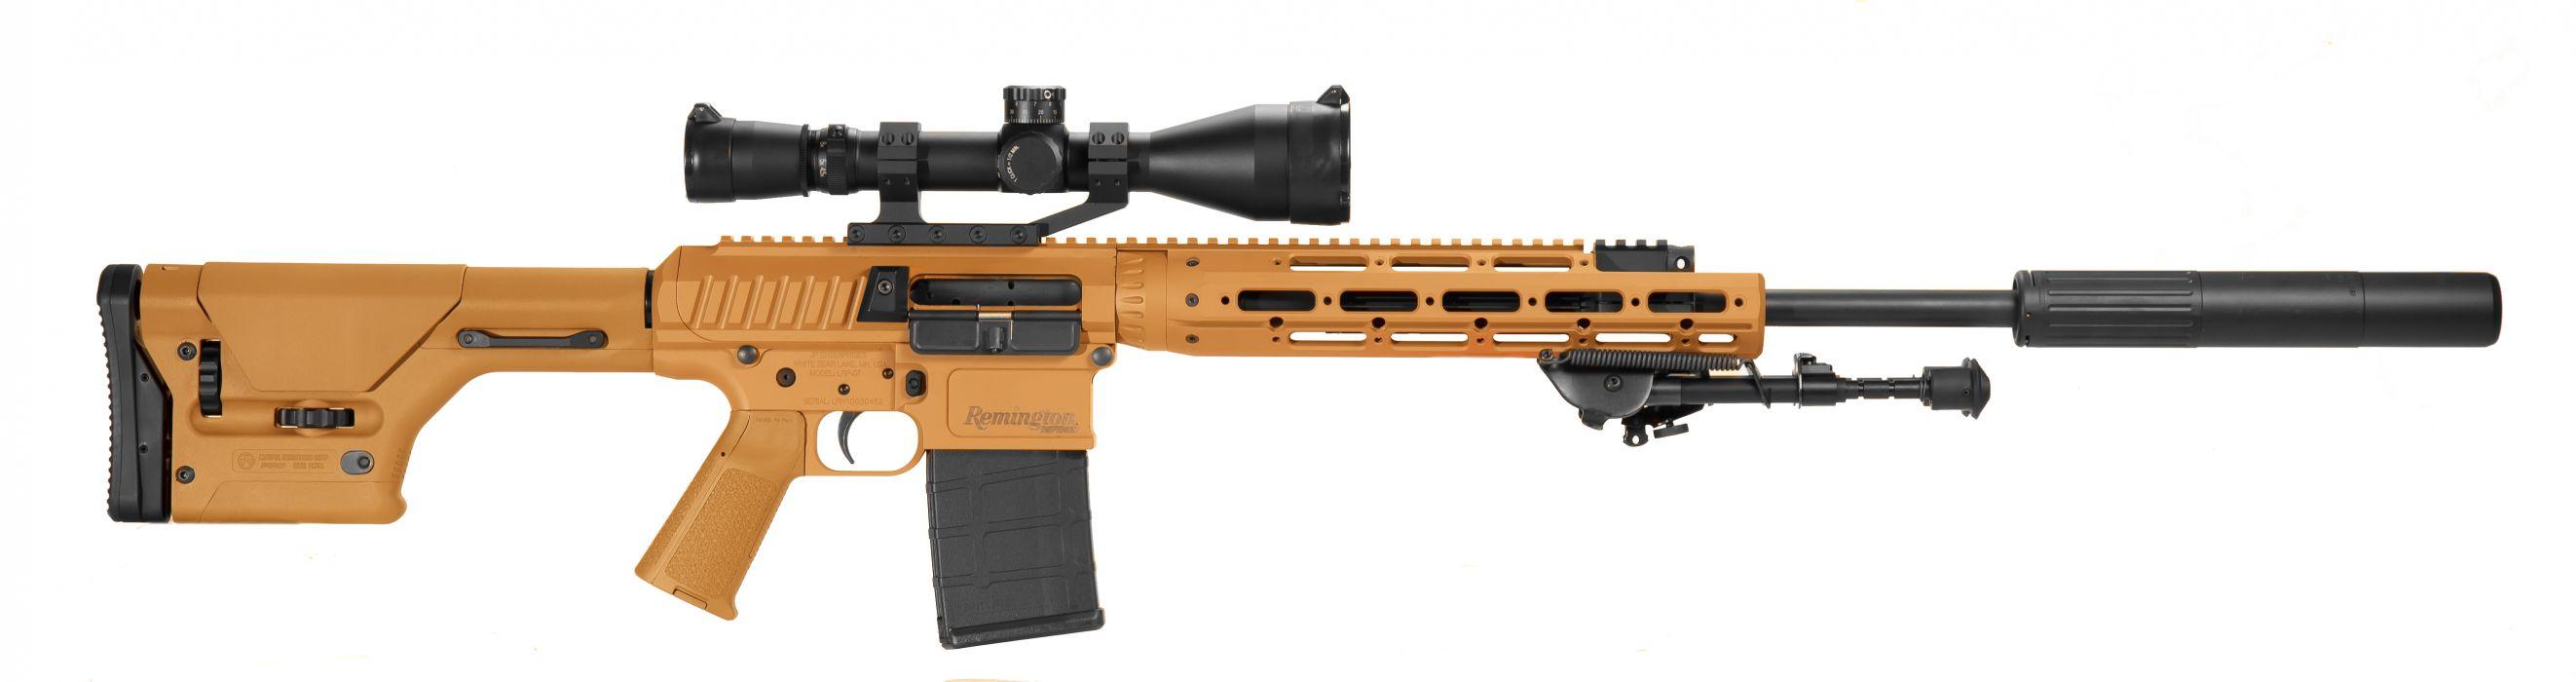 Remington ACR weapon gun military rifle police    eg wallpaper